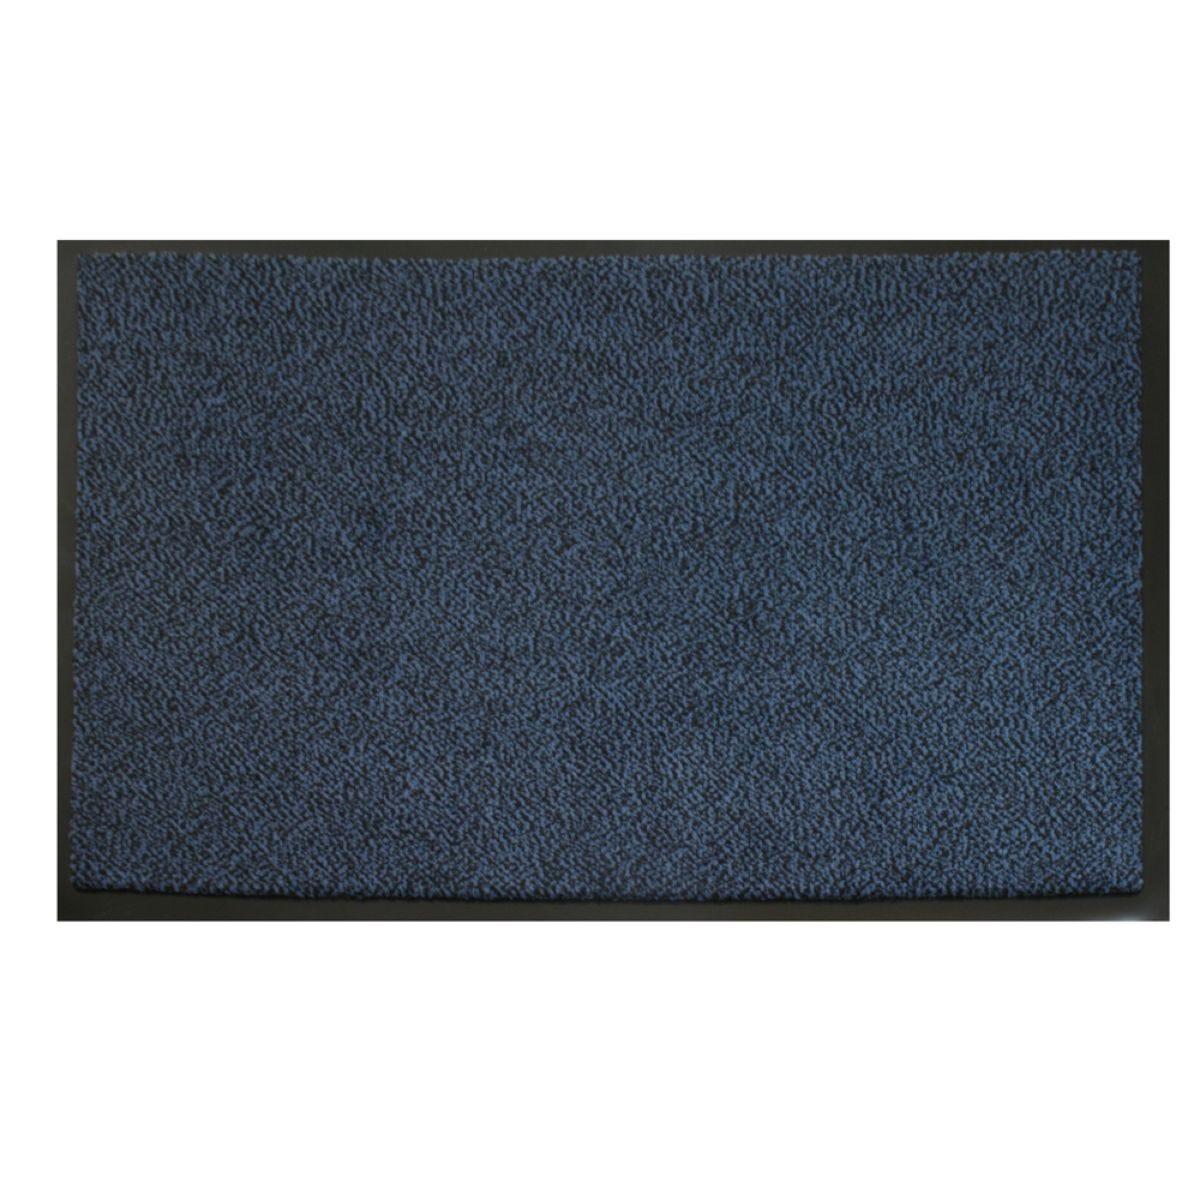 JVL Heavy Duty Commodore Backed Barrier Door Floor Mat Blue/Black 120 x 170 cm